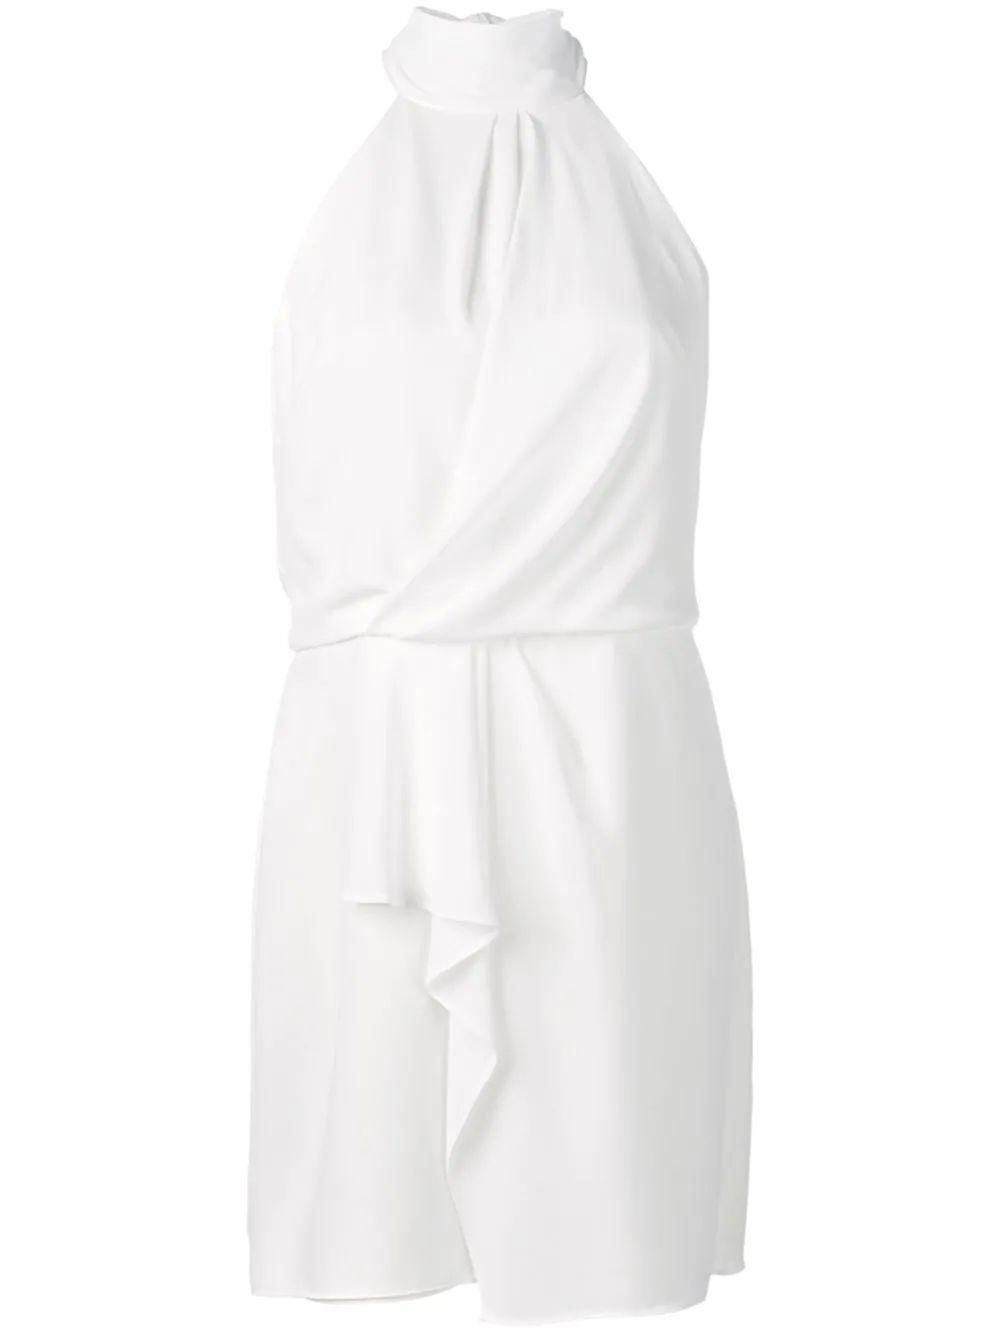 Sleeveless Mock Neck Dress With Drape Detail Item # SGE152838